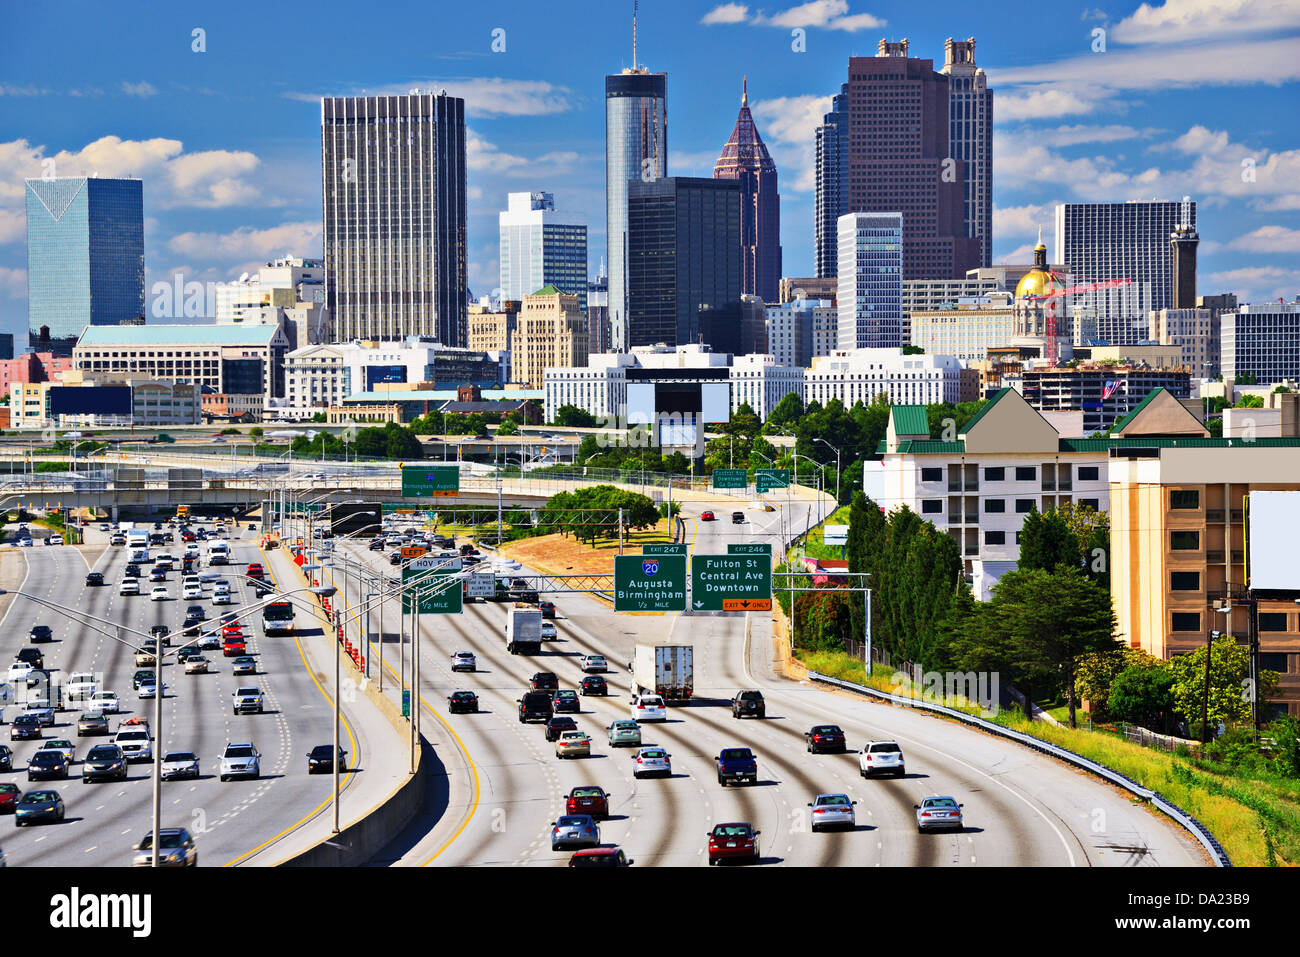 Skyline of downtown Atlanta, Georgia. - Stock Image